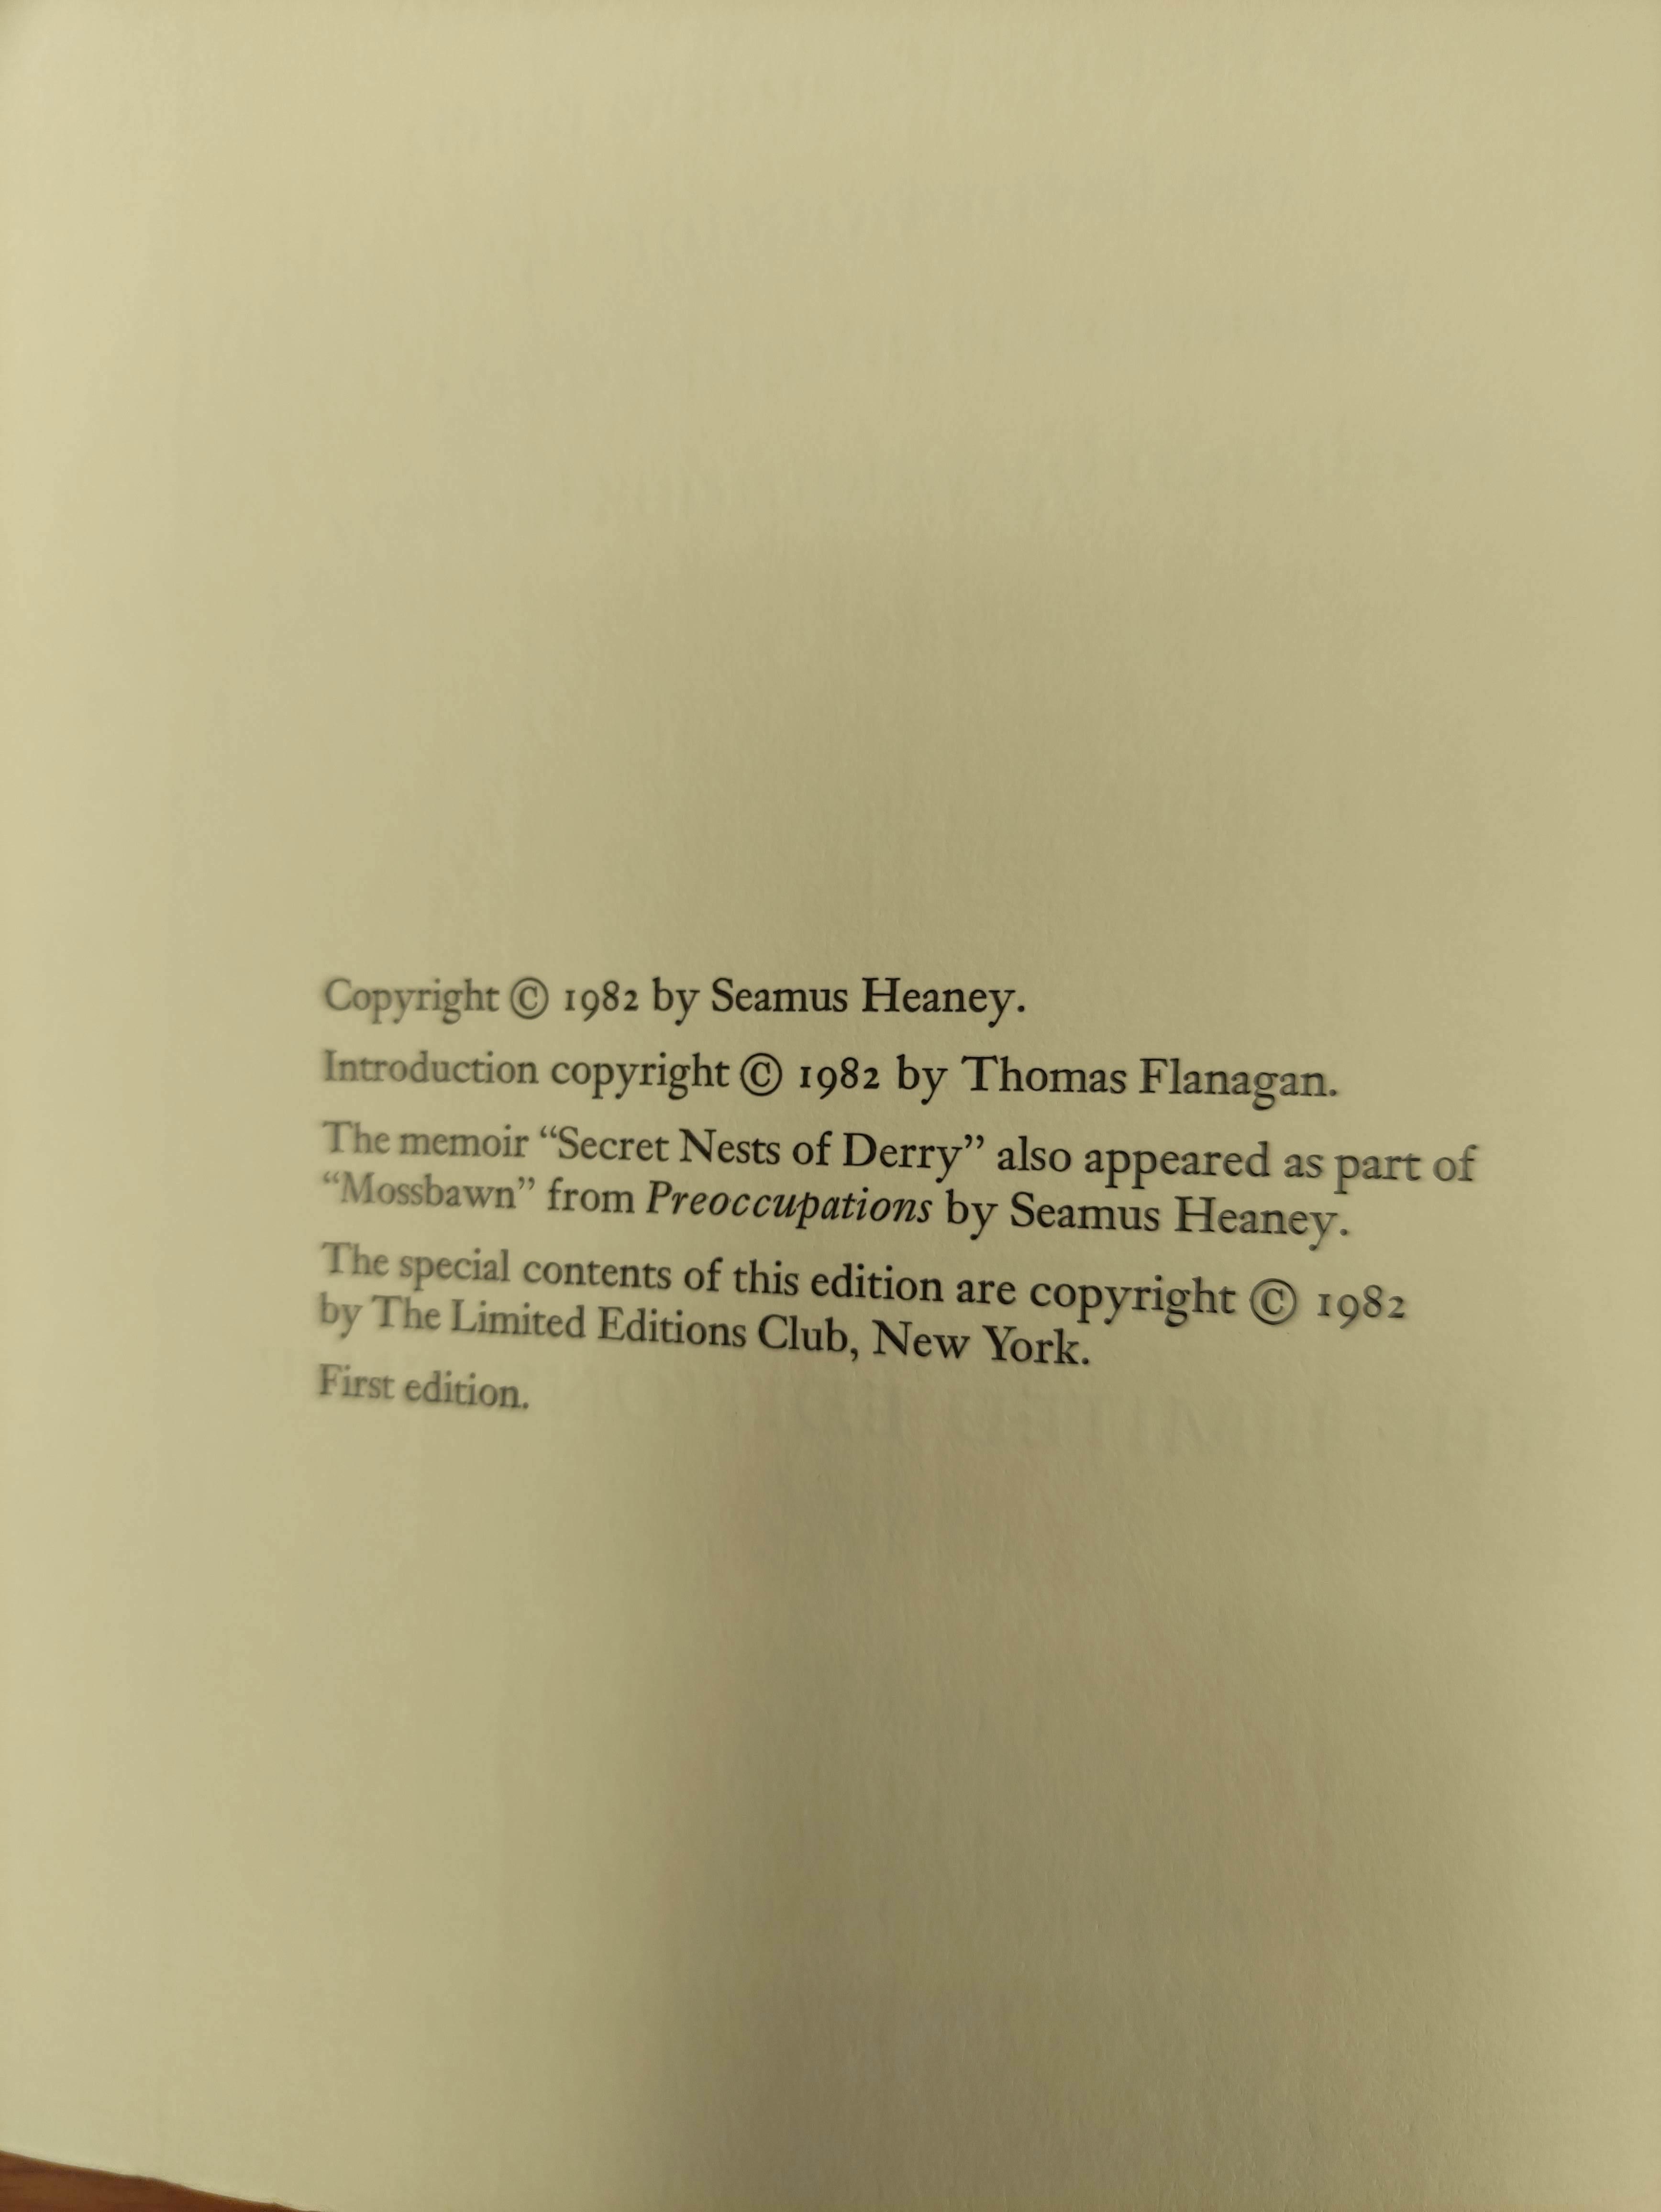 HEANEY SEAMUS.Poems & Memoir. Signed ltd. ed. 1197/2000. Plates. Folio. Calf in slip case. Limited - Image 5 of 8